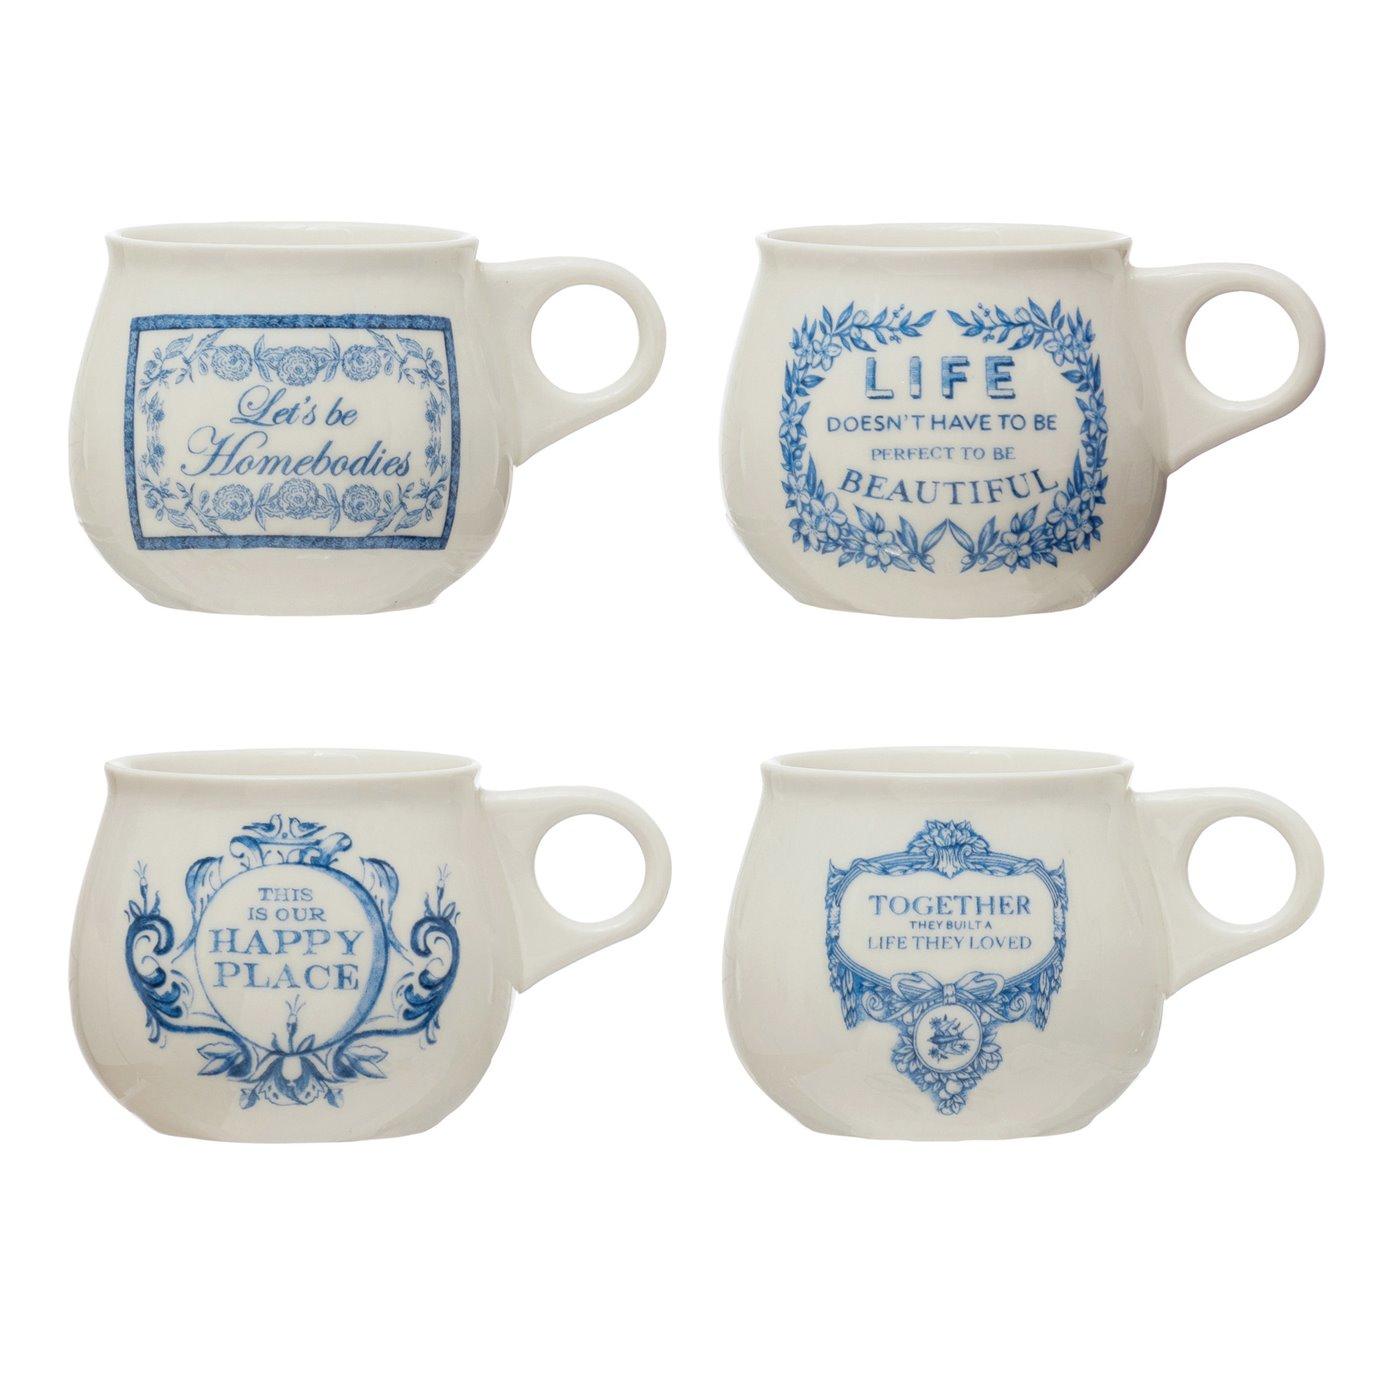 10 oz. Stoneware Mug w/ Saying, White & Blue, 4 Styles ©